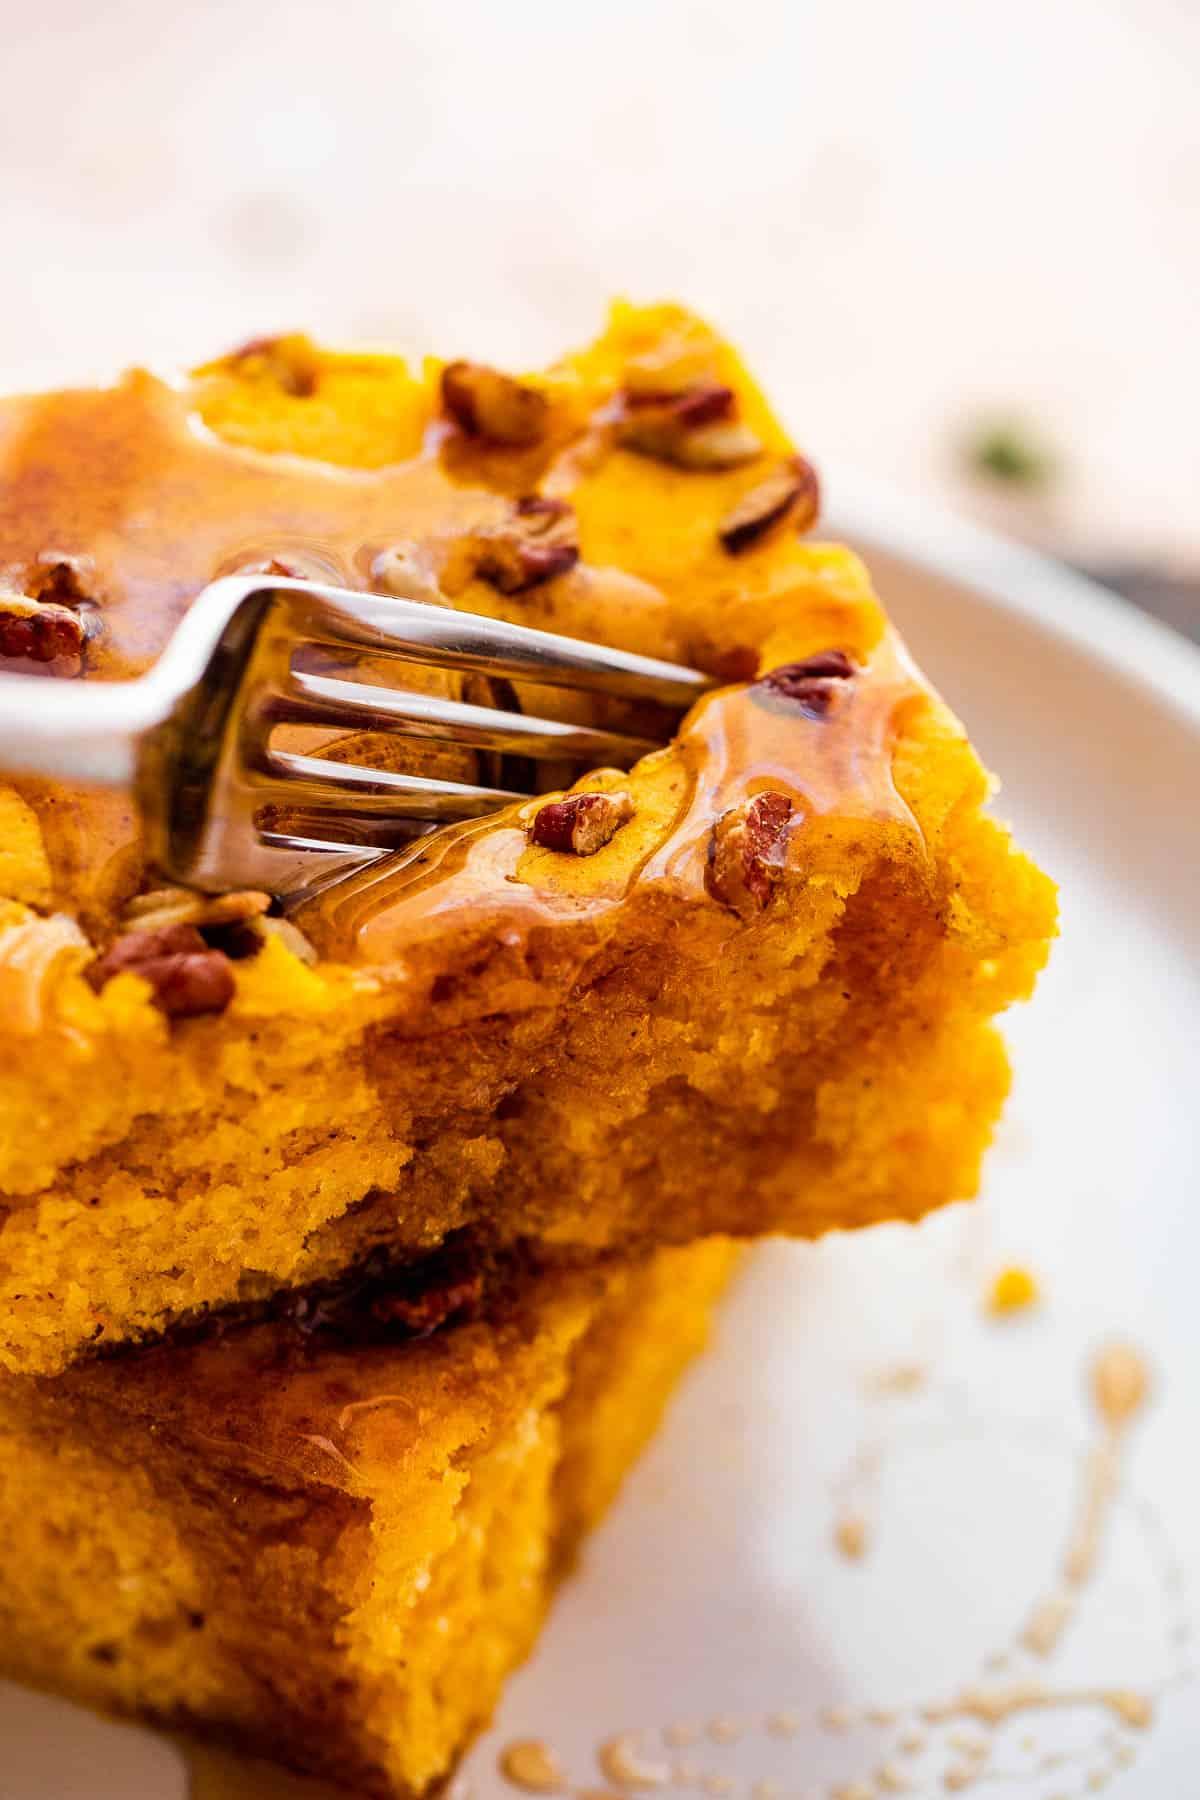 fork cutting into a pumpkin pancake